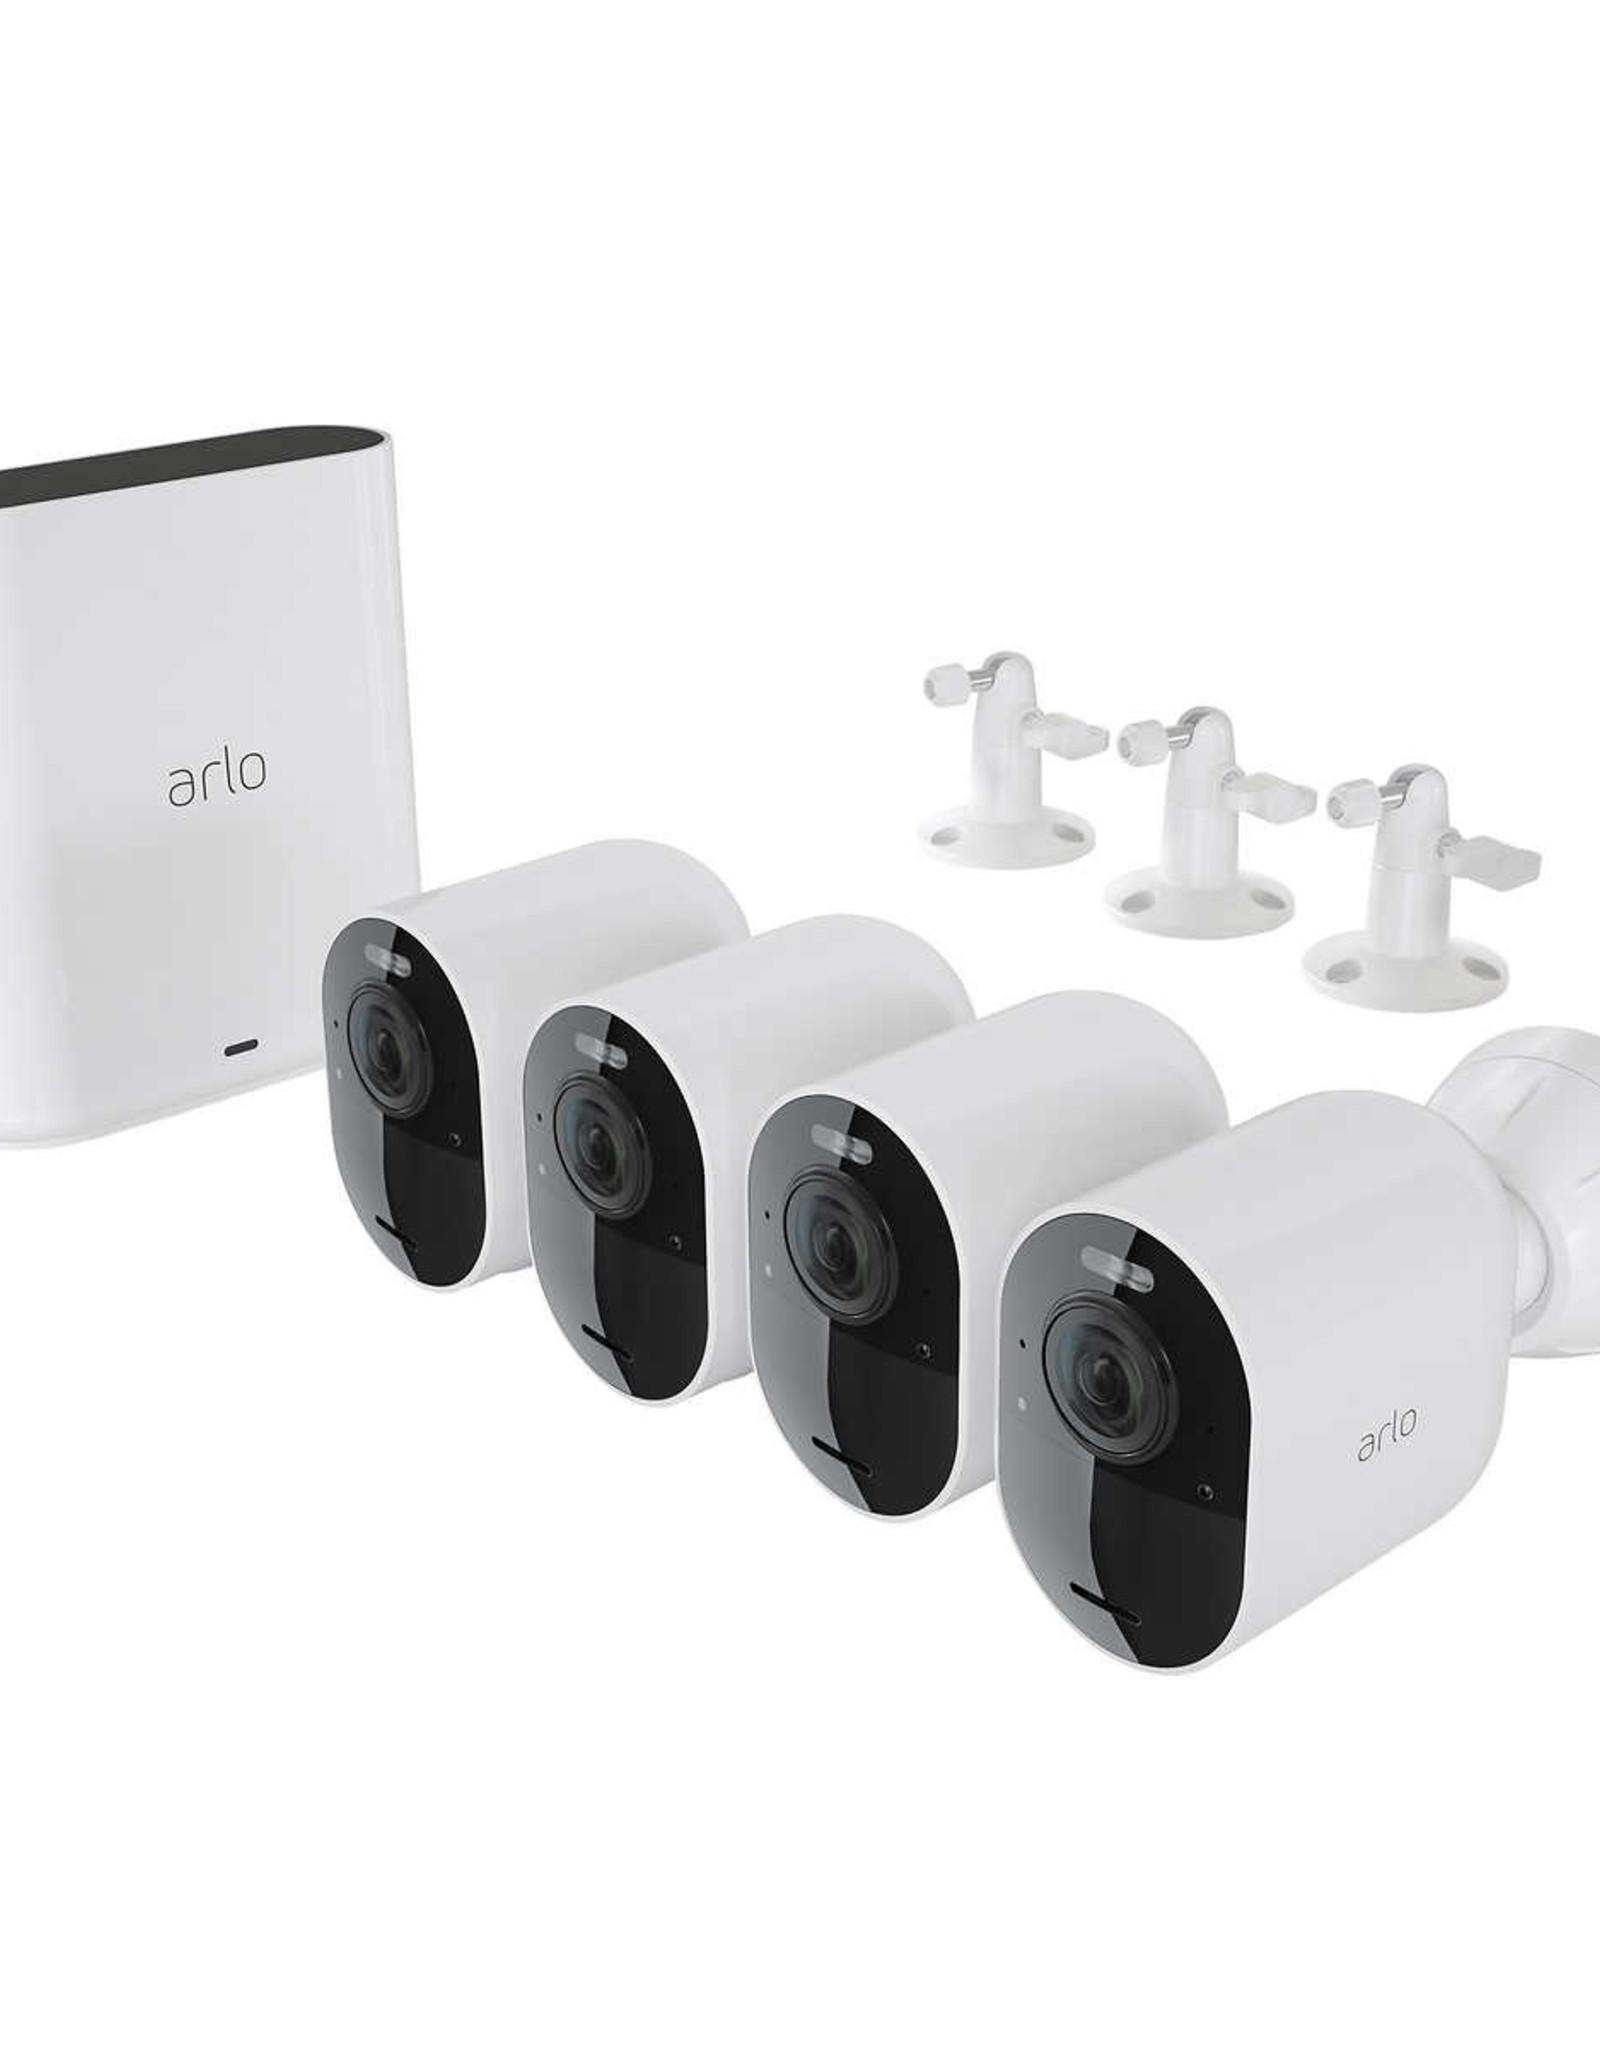 Arlo Arlo - Essential Spotlight Camera – Indoor/Outdoor Wire-Free 1080p Security Camera (4-pack) - White